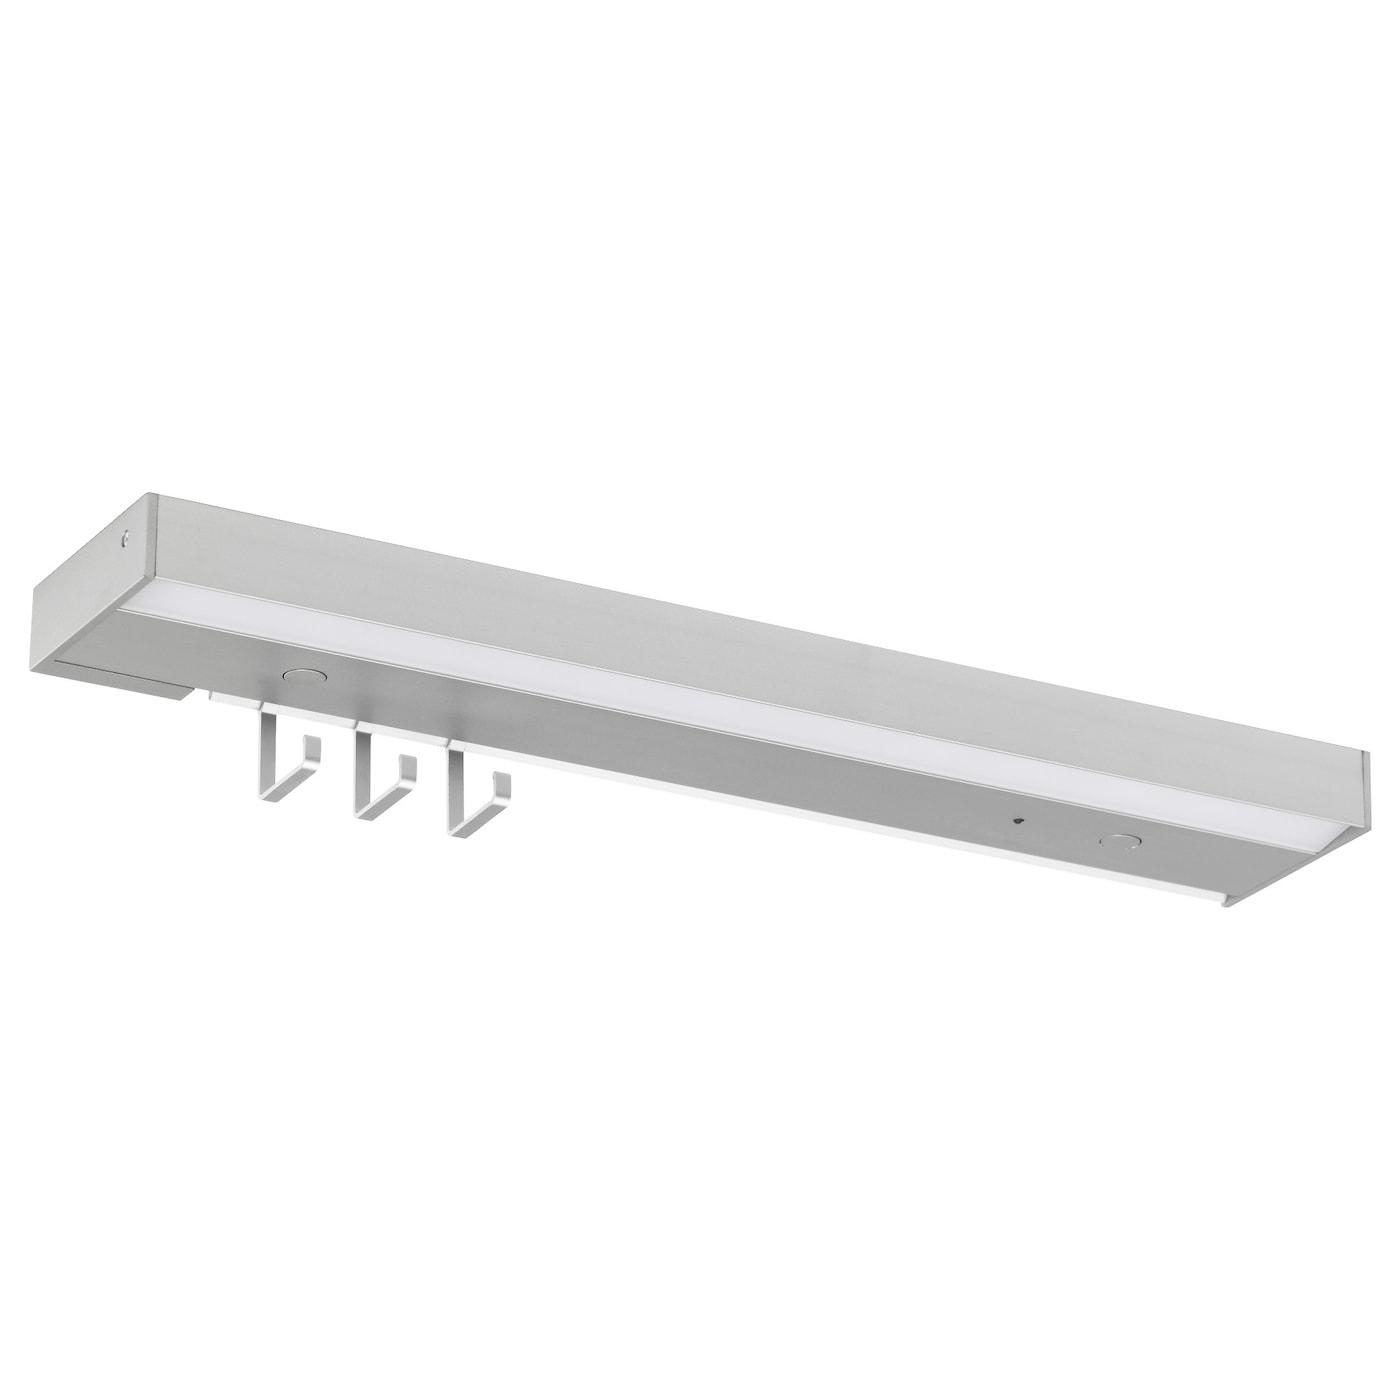 LED Strip Lights & Integrated Lighting | IKEA